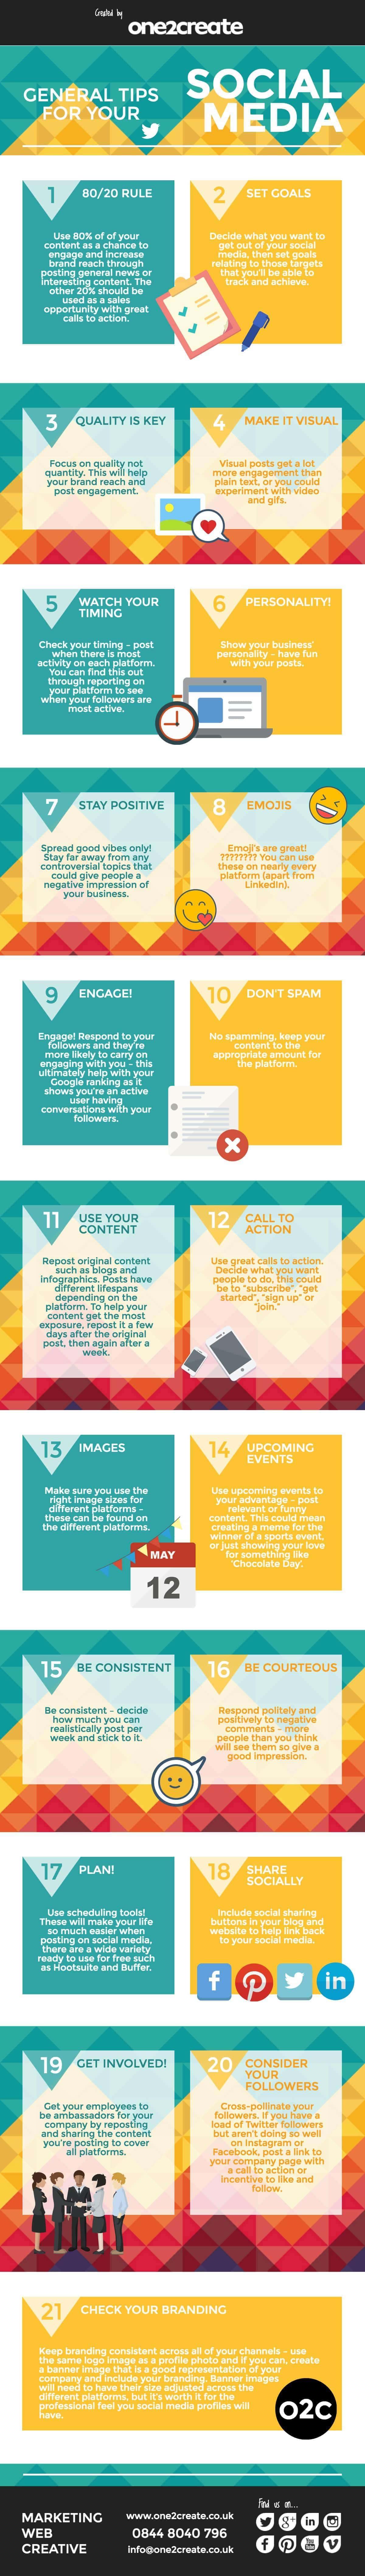 21 general tips social media - 21 Top Tips for Social Media Success